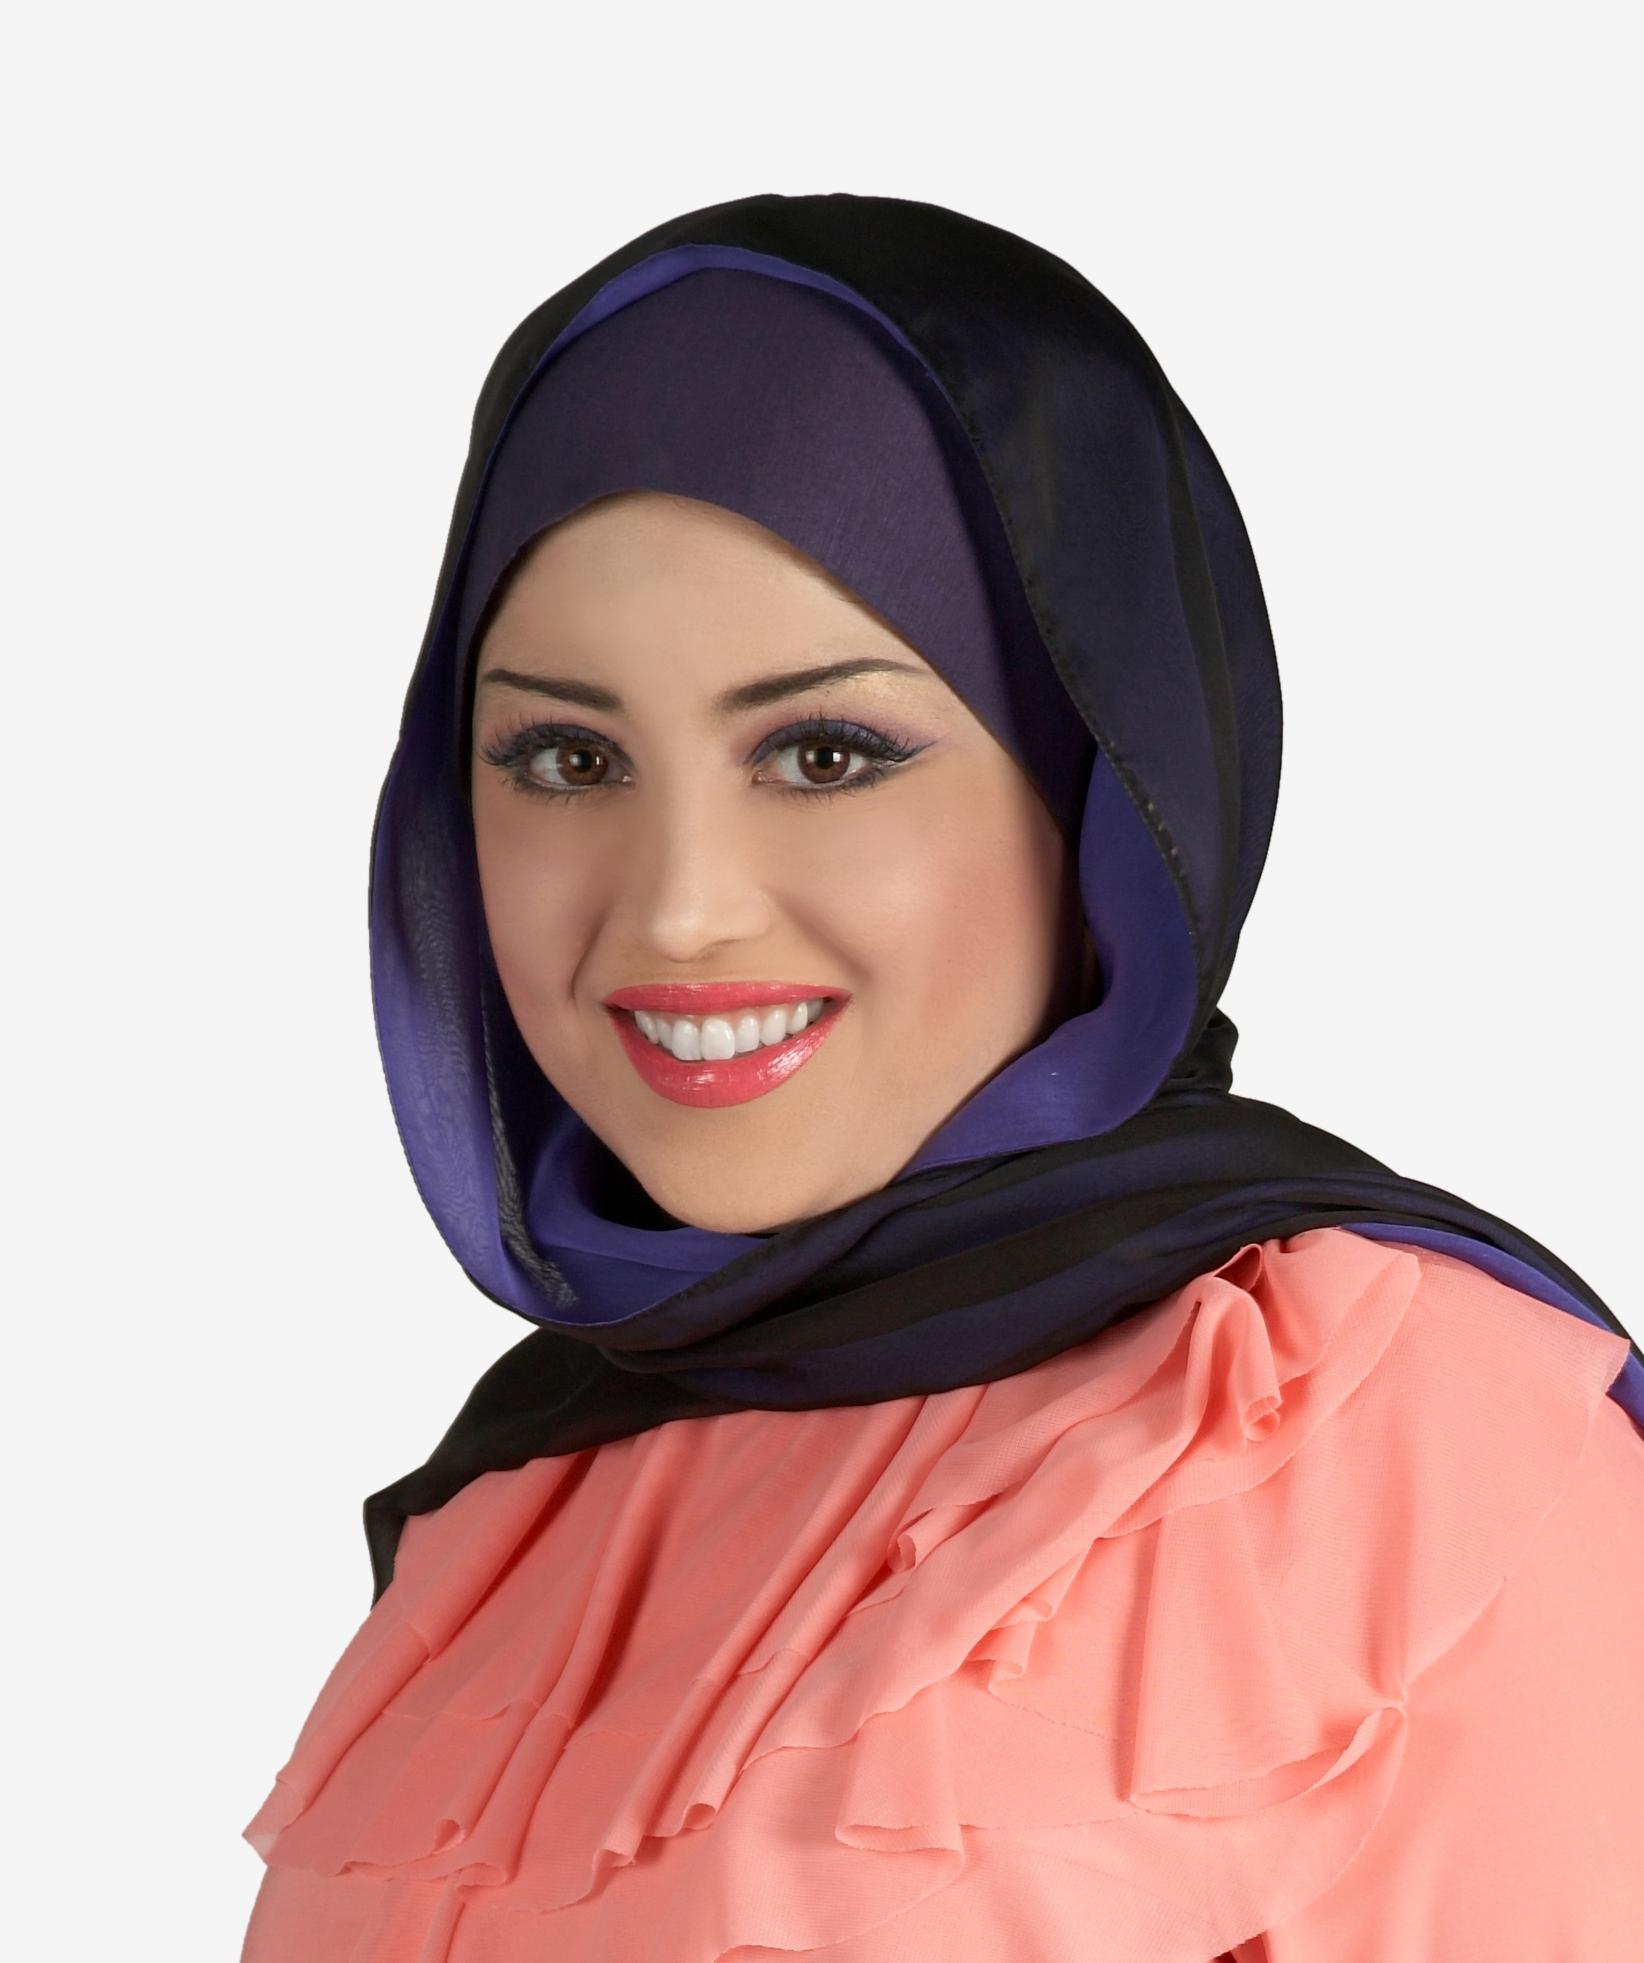 Manar Al Hashash